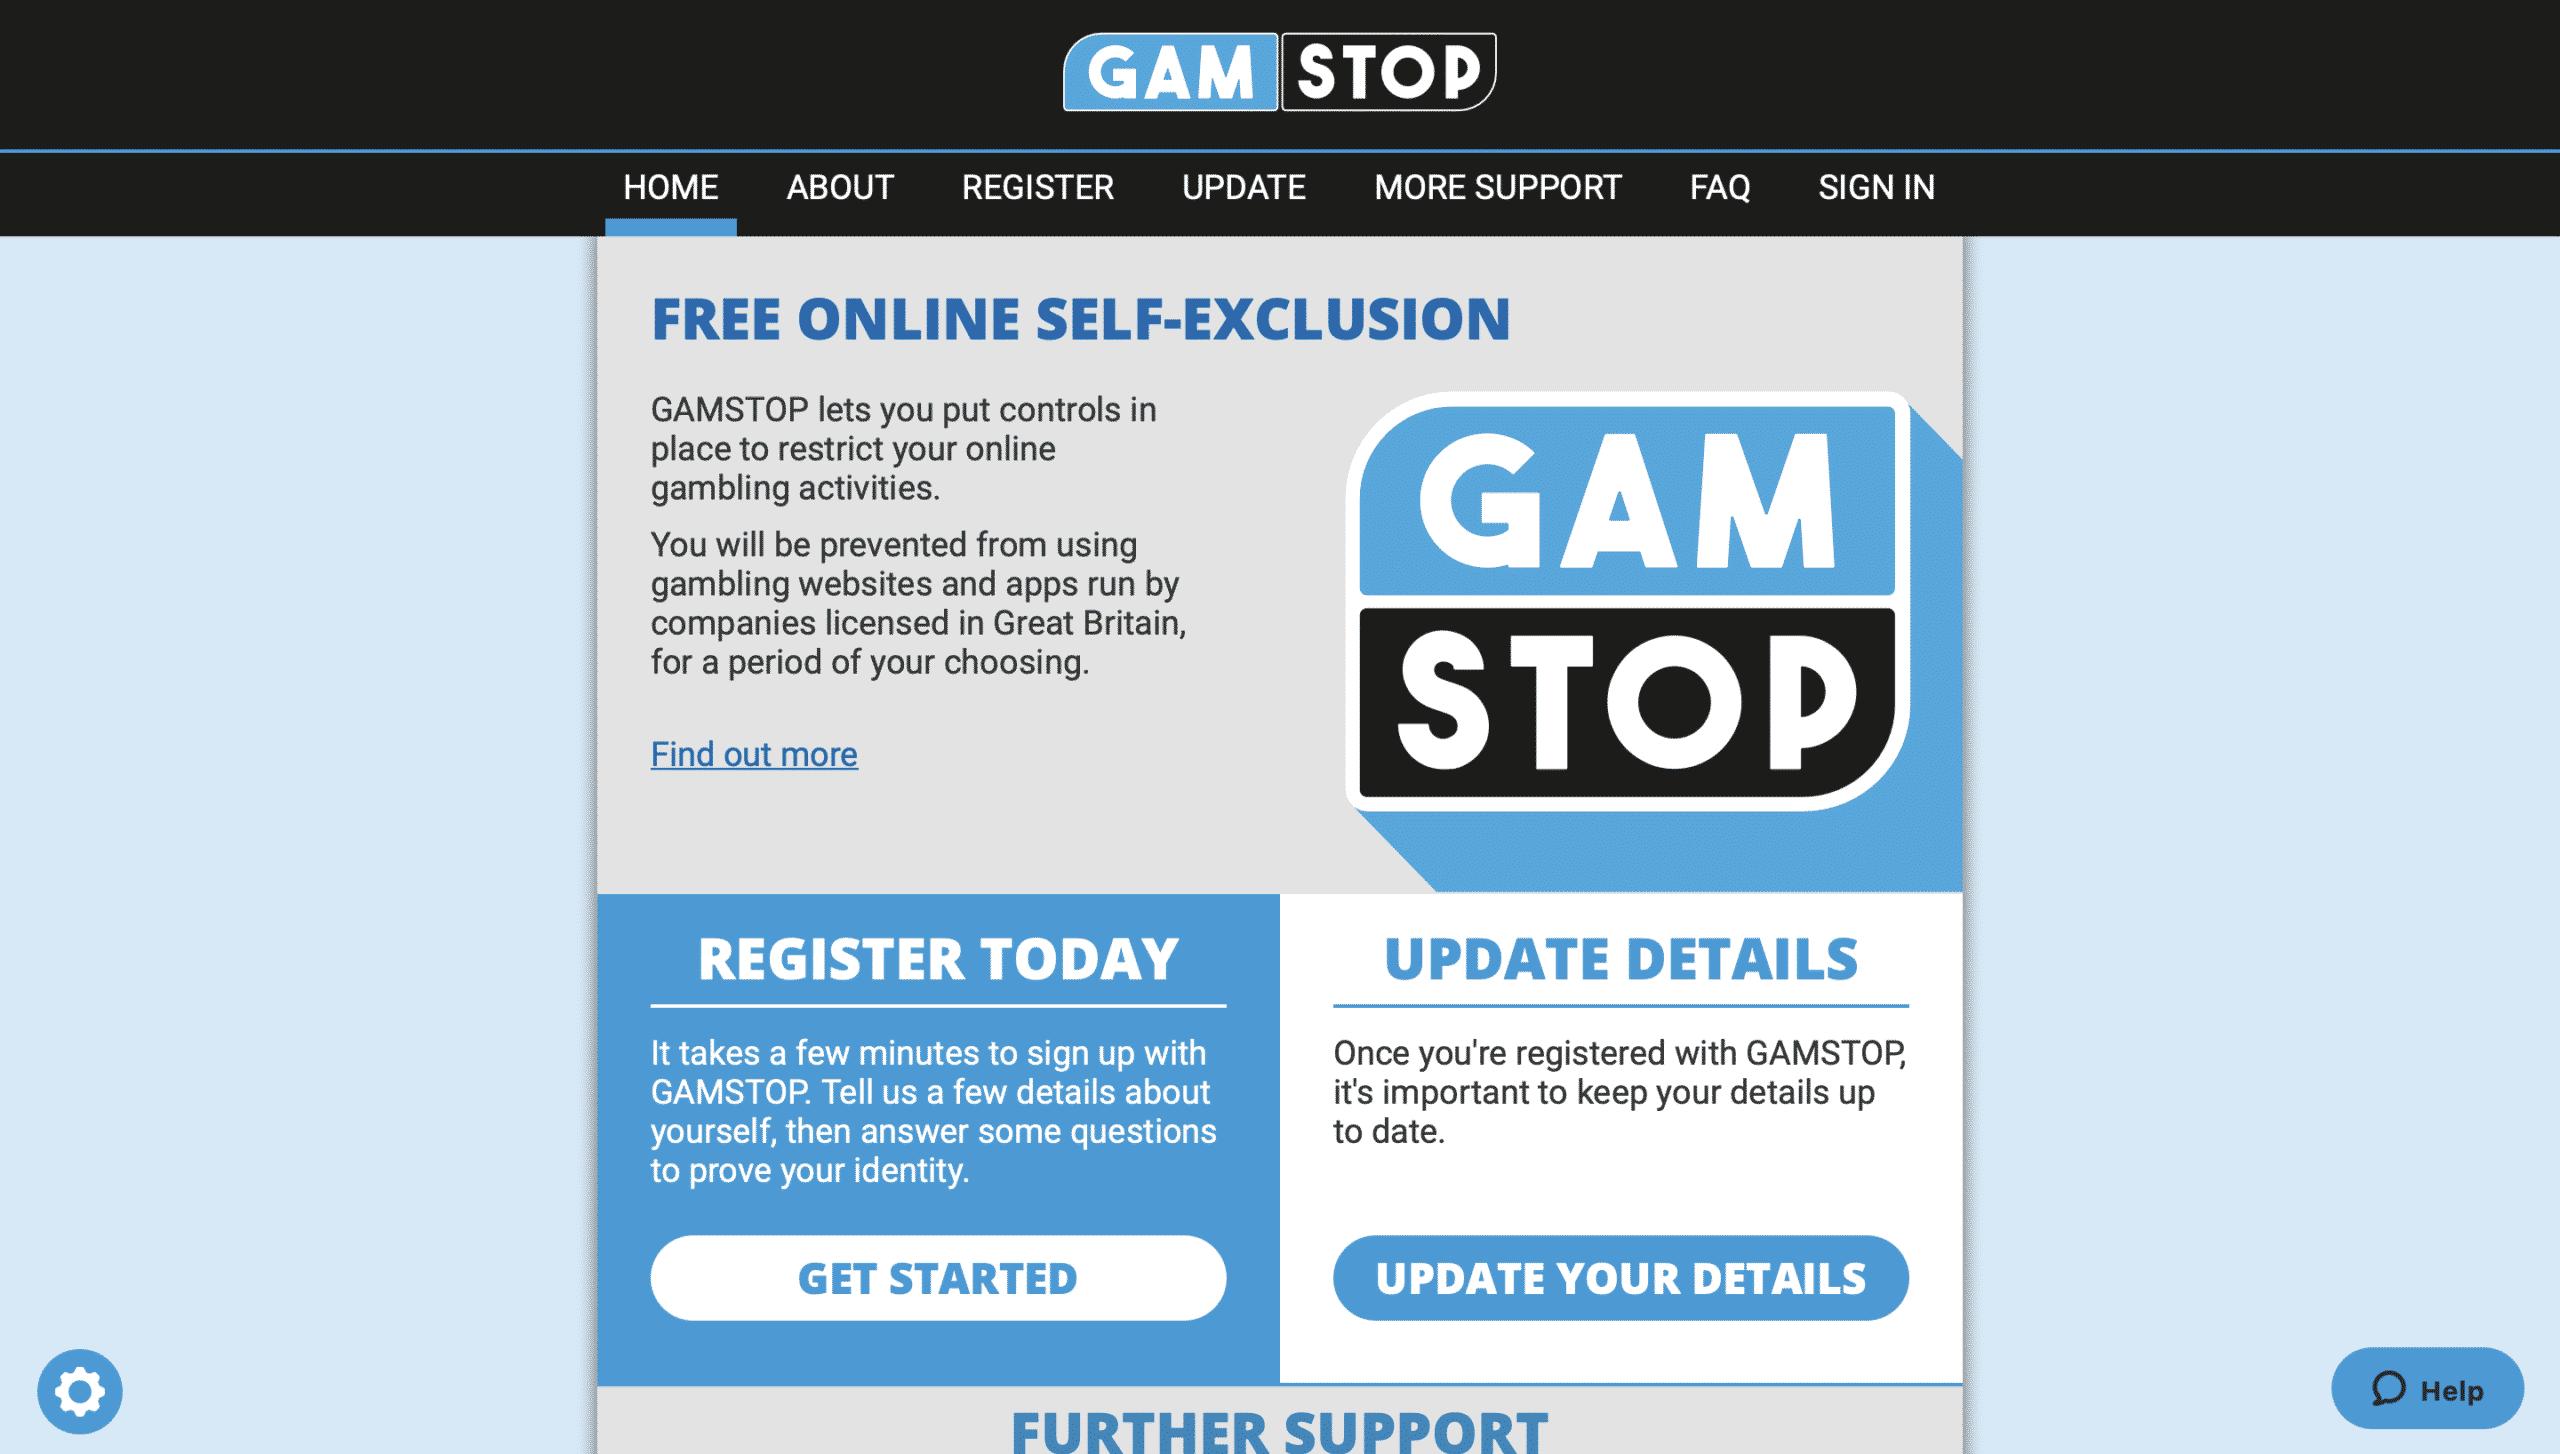 GAMSTOP Online Self Exclusion Scheme